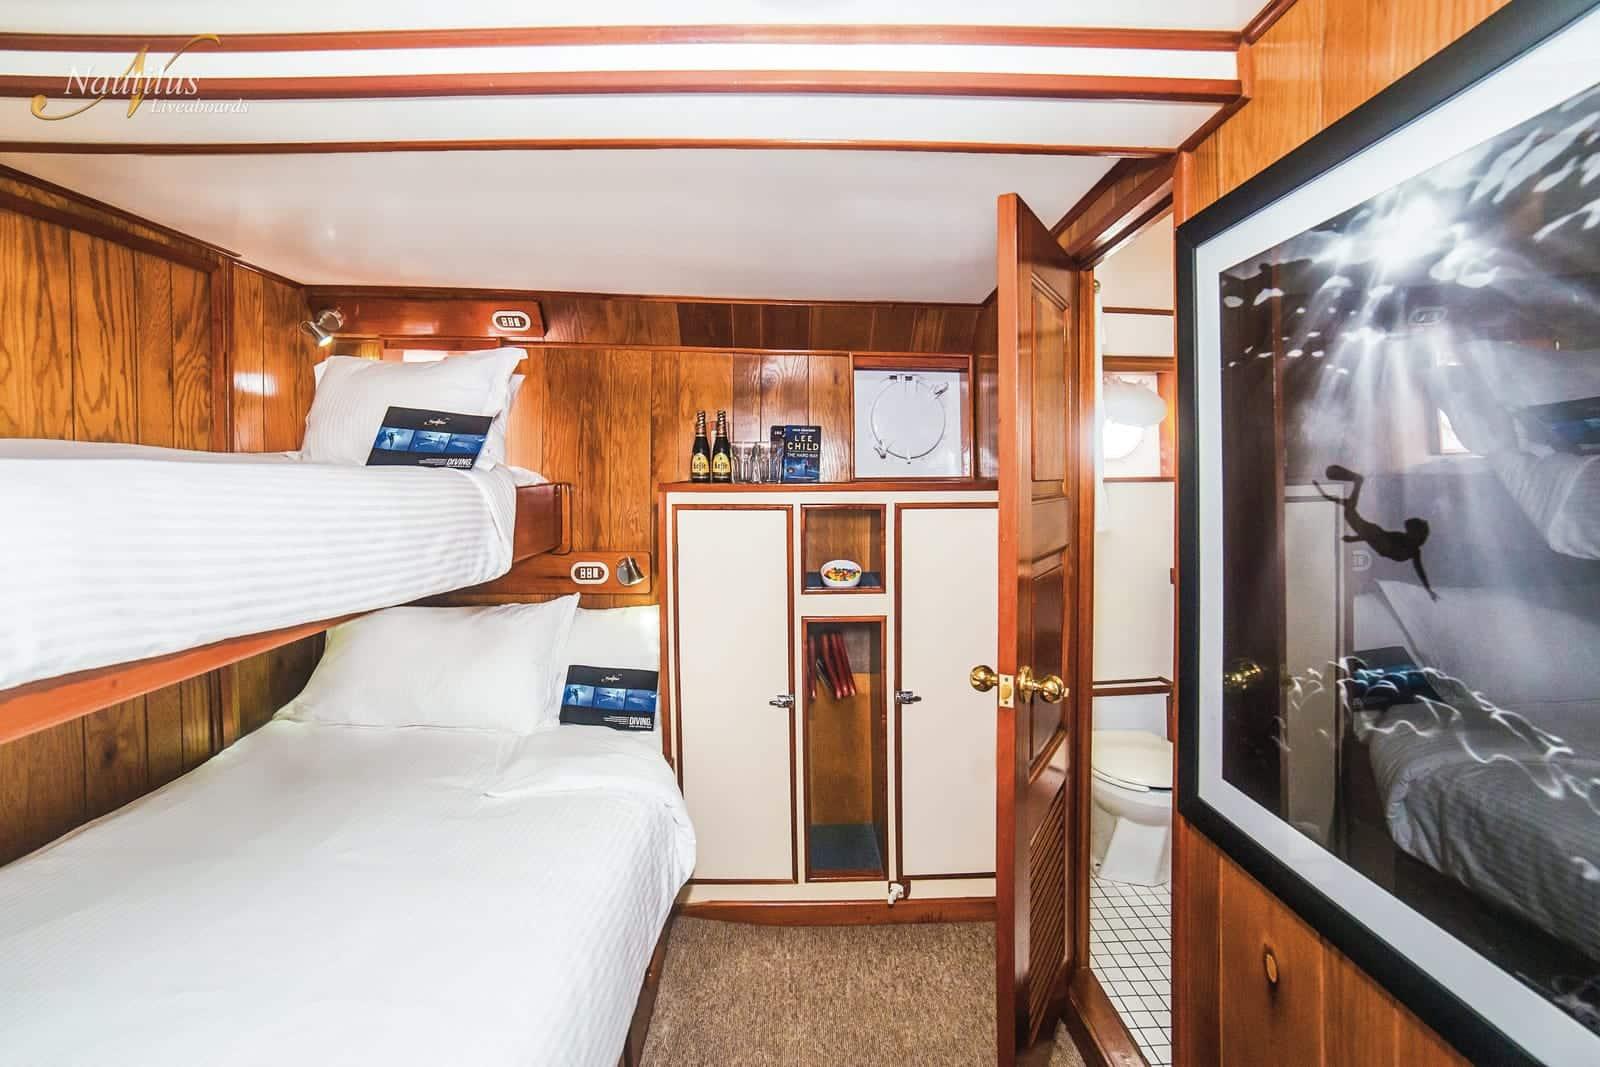 Nautilus Undersea liveaboard socorro double stateroom